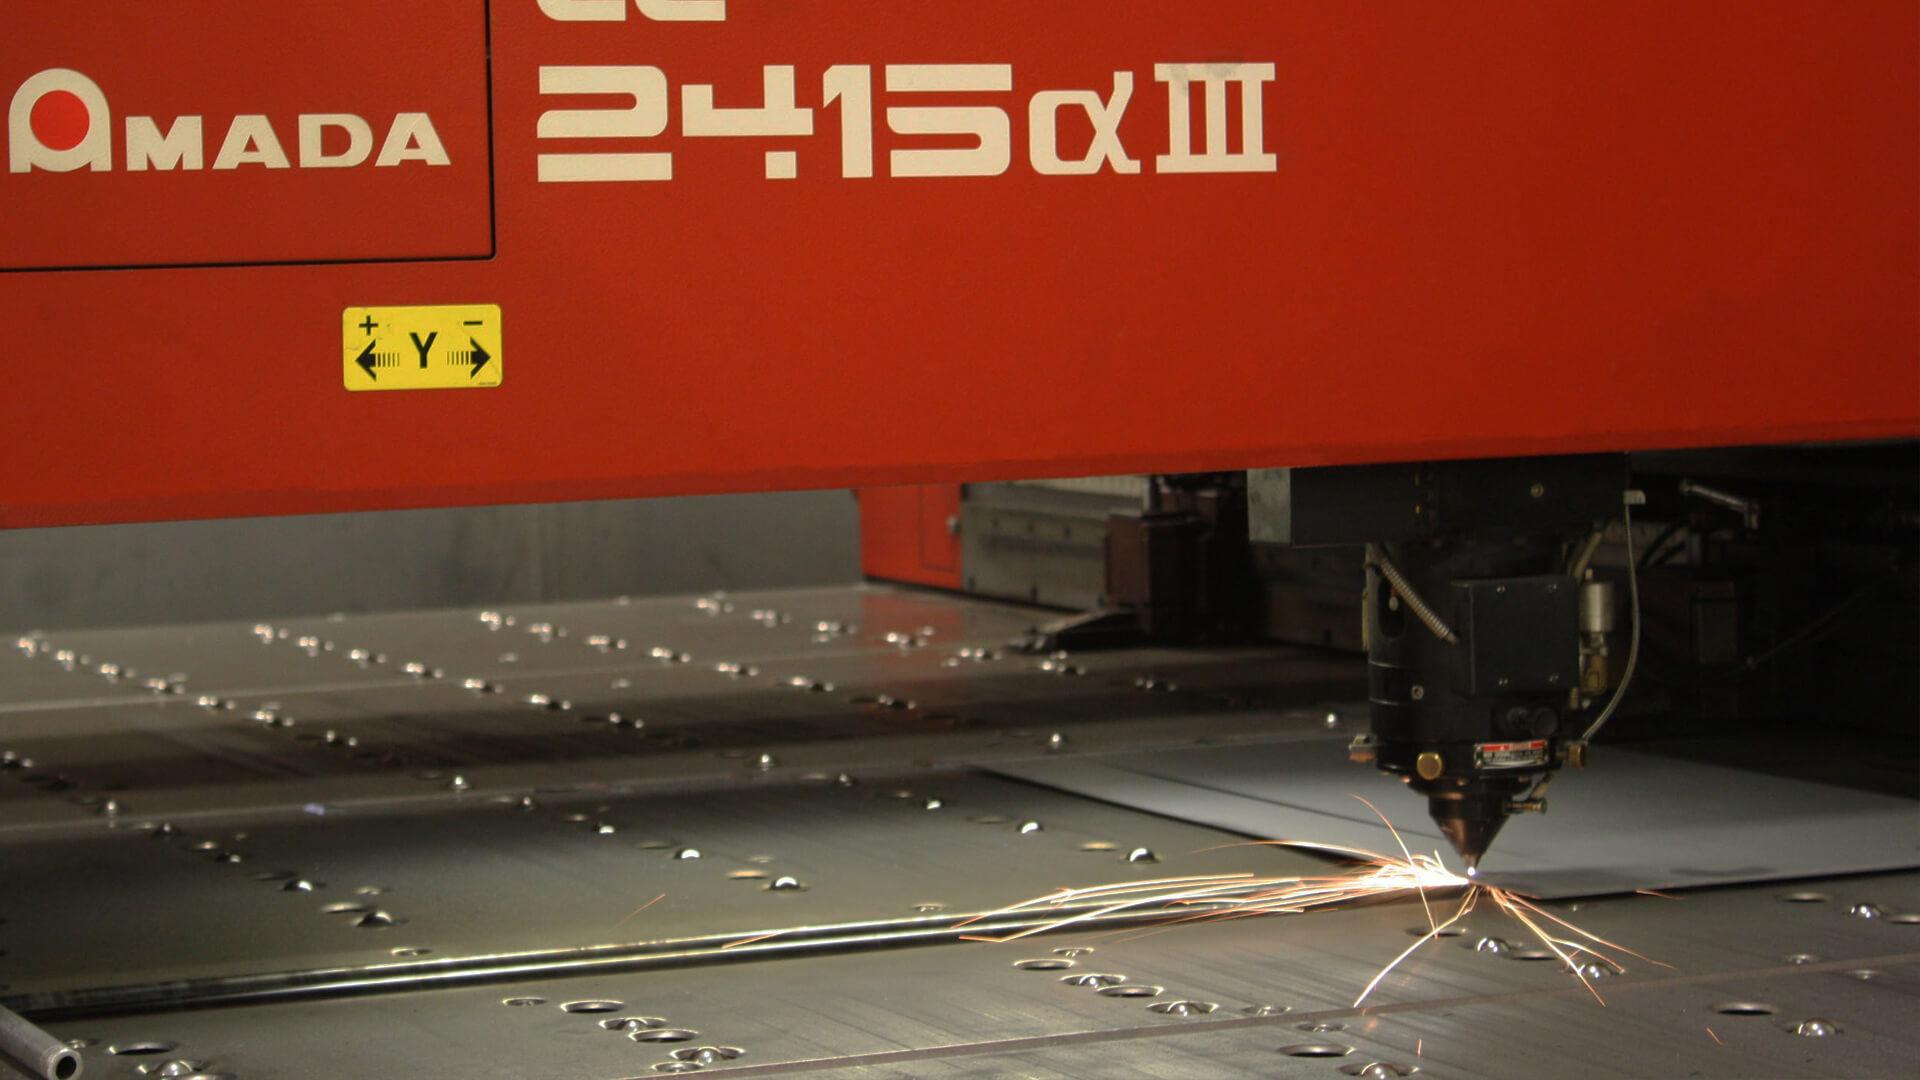 machine cutting sheet of metal